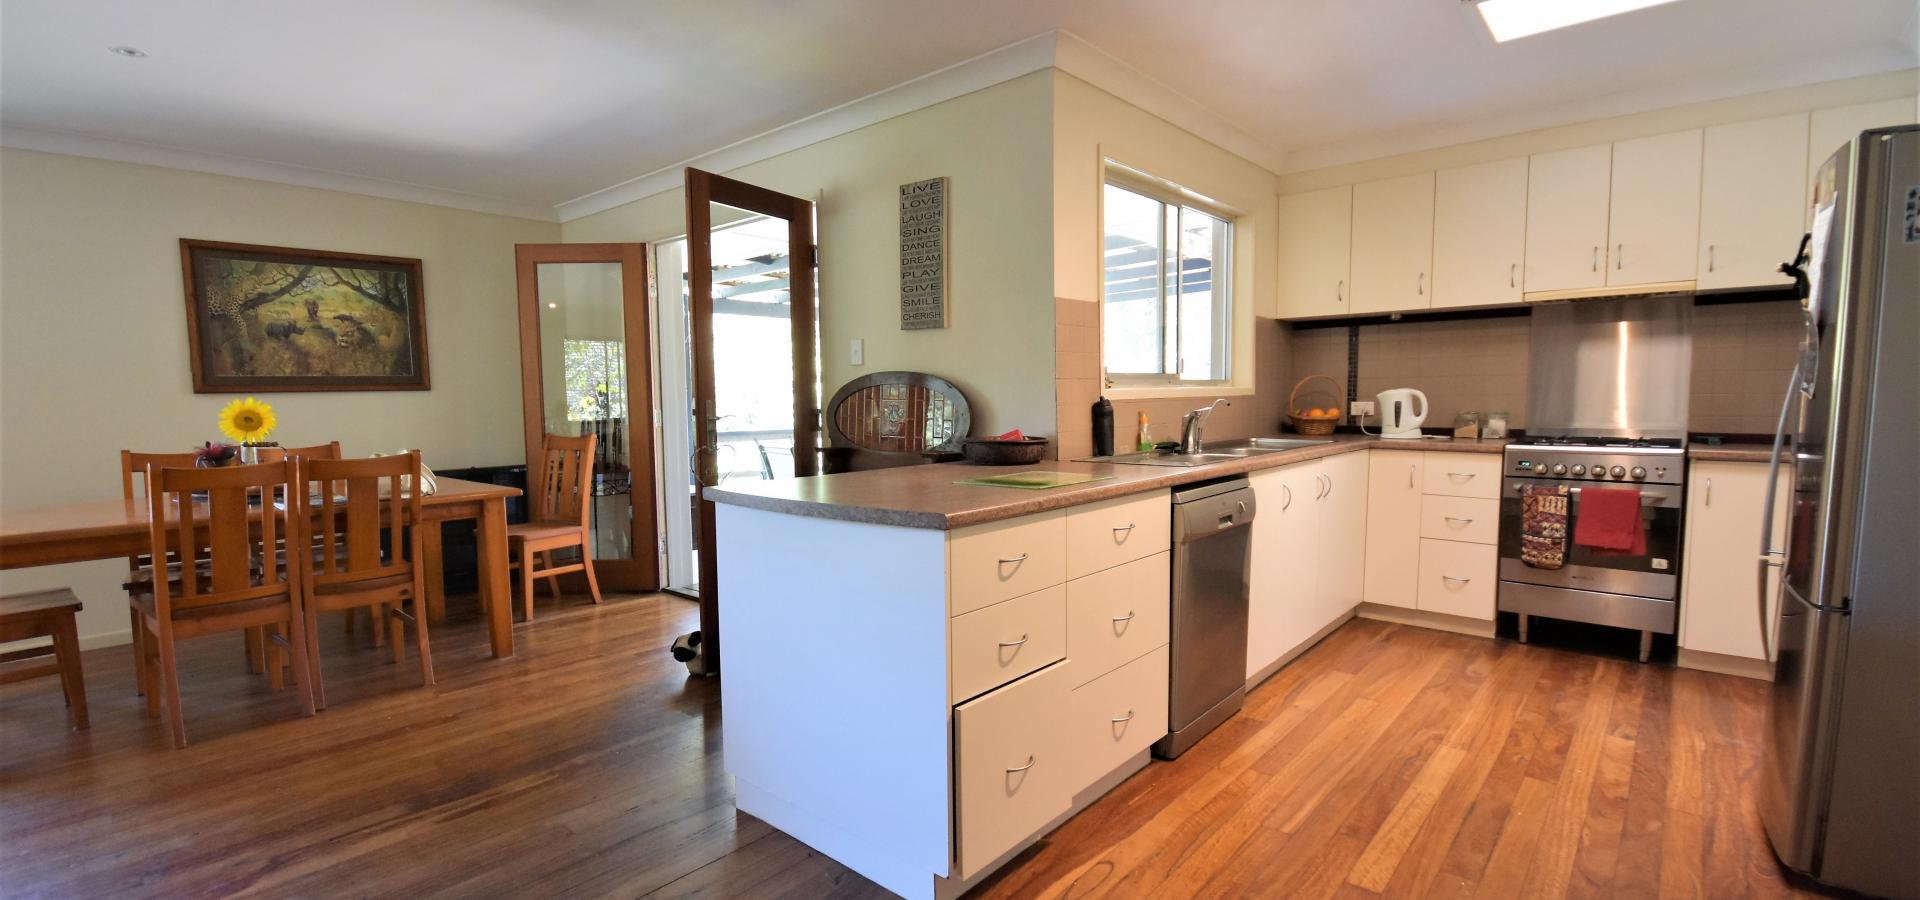 Quality Older Home